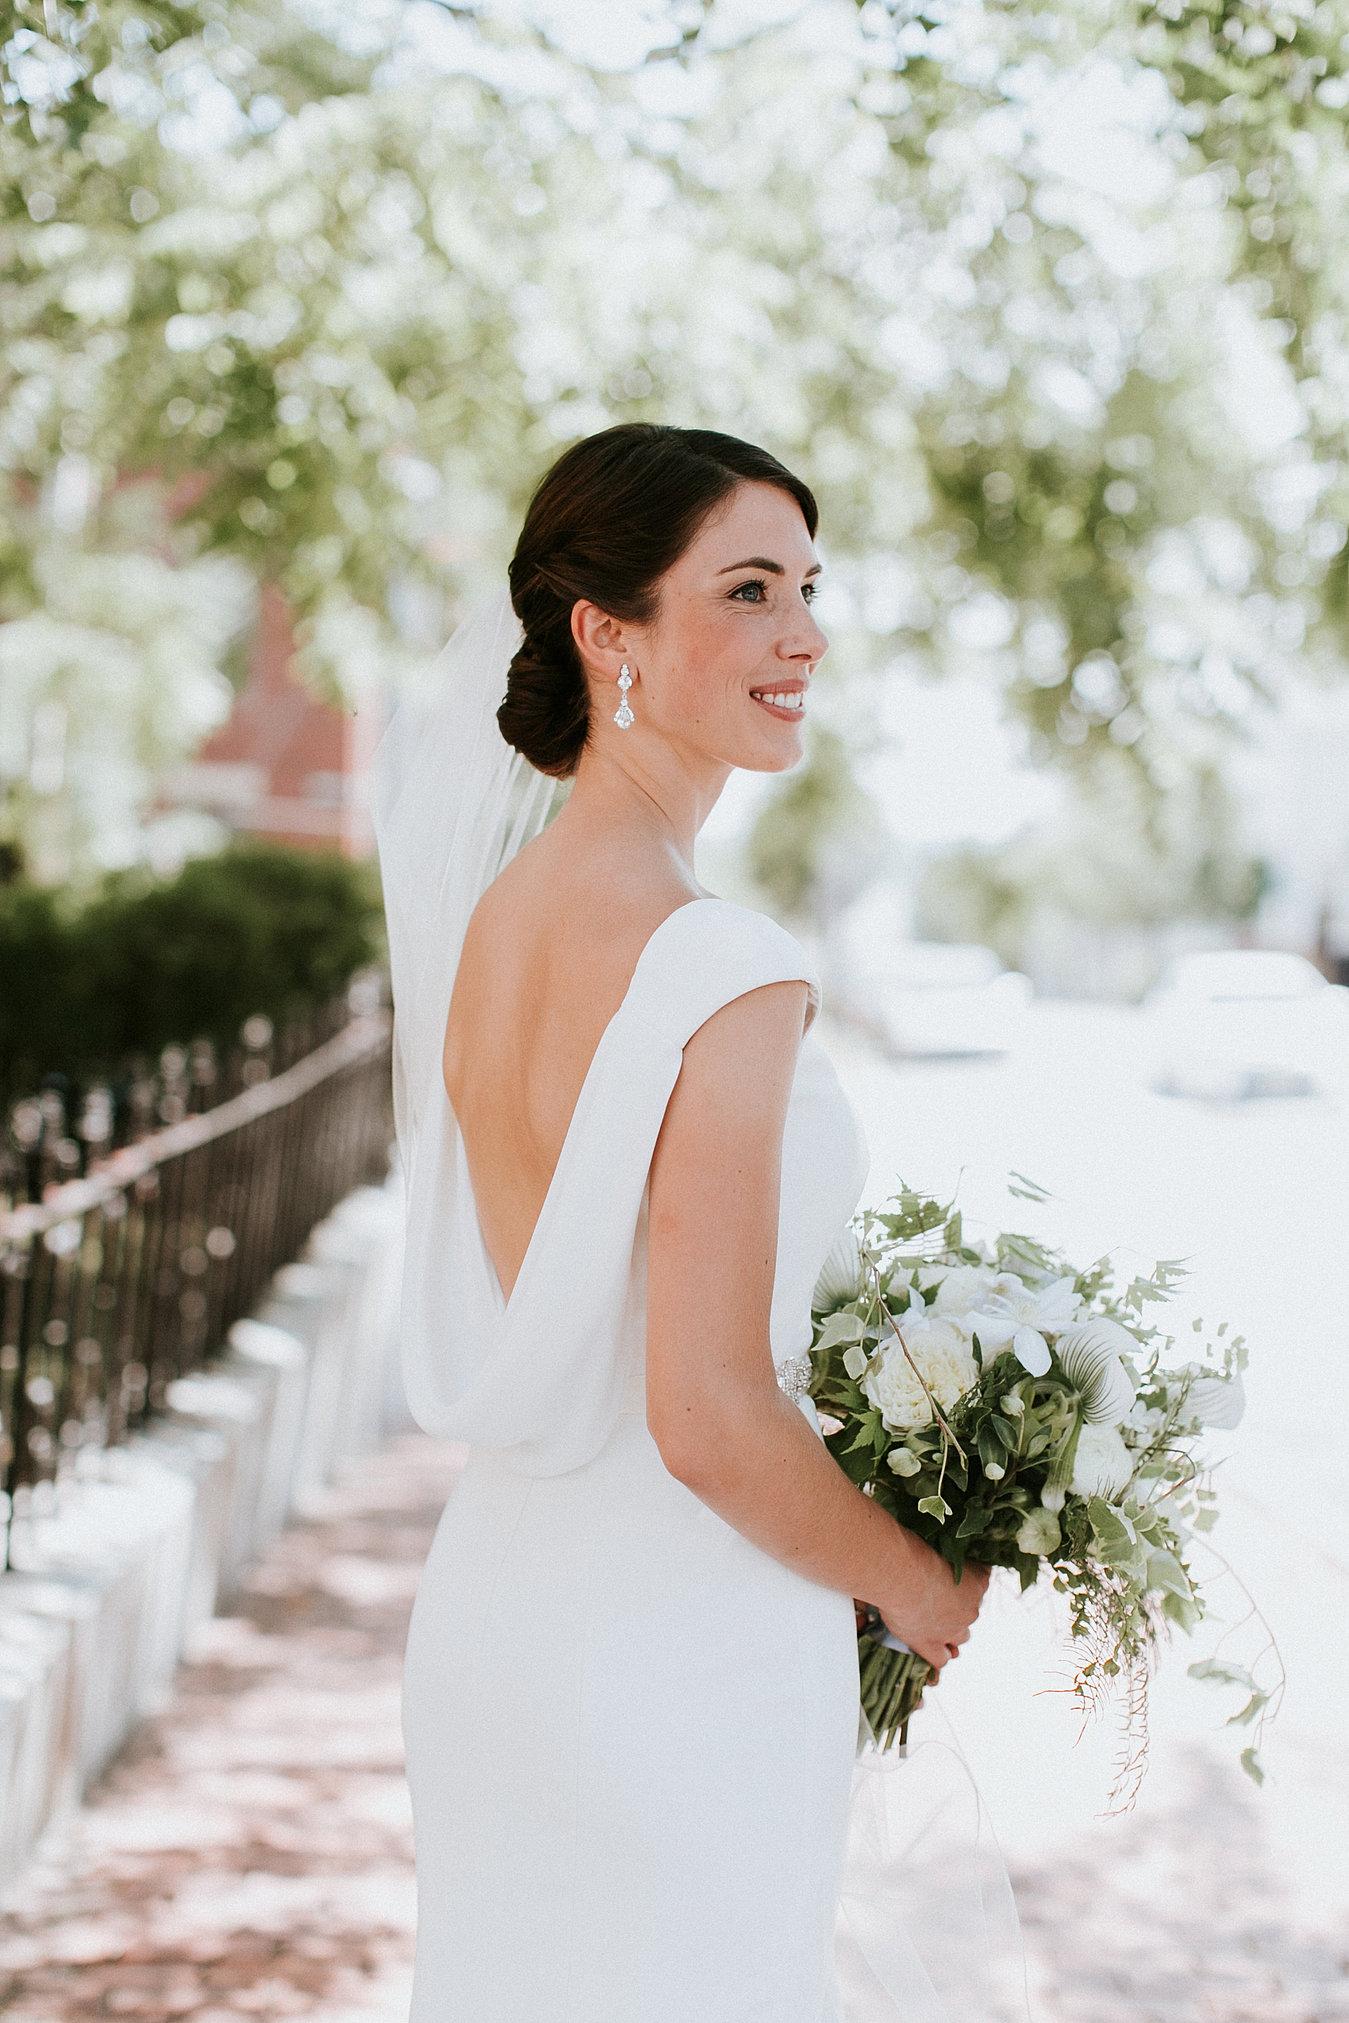 aphrodite salon   wedding hair   bridal hair   specialist   maine